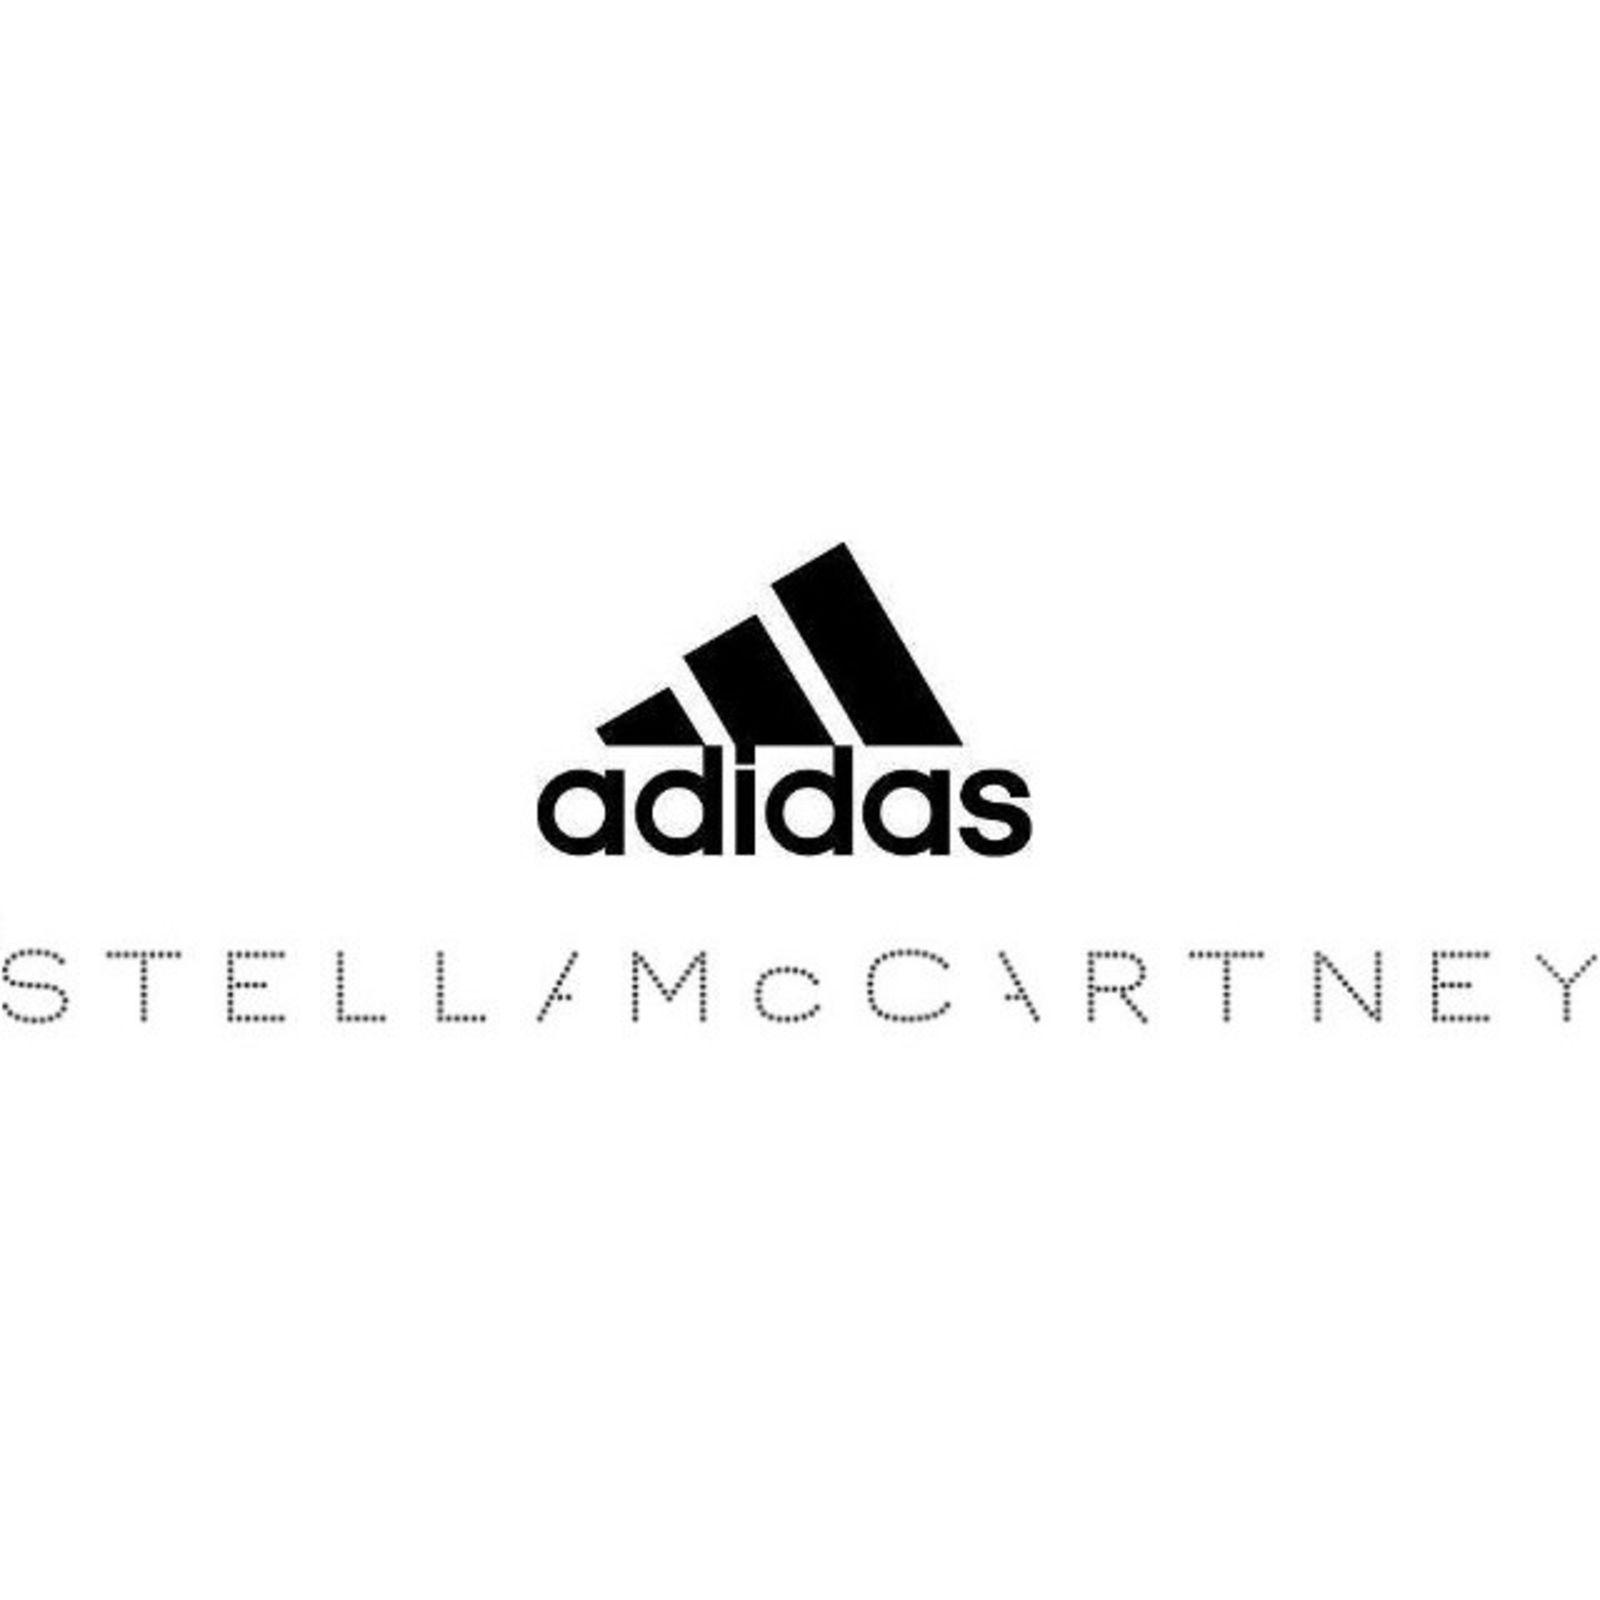 adidas x STELLA McCARTNEY (Image 1)